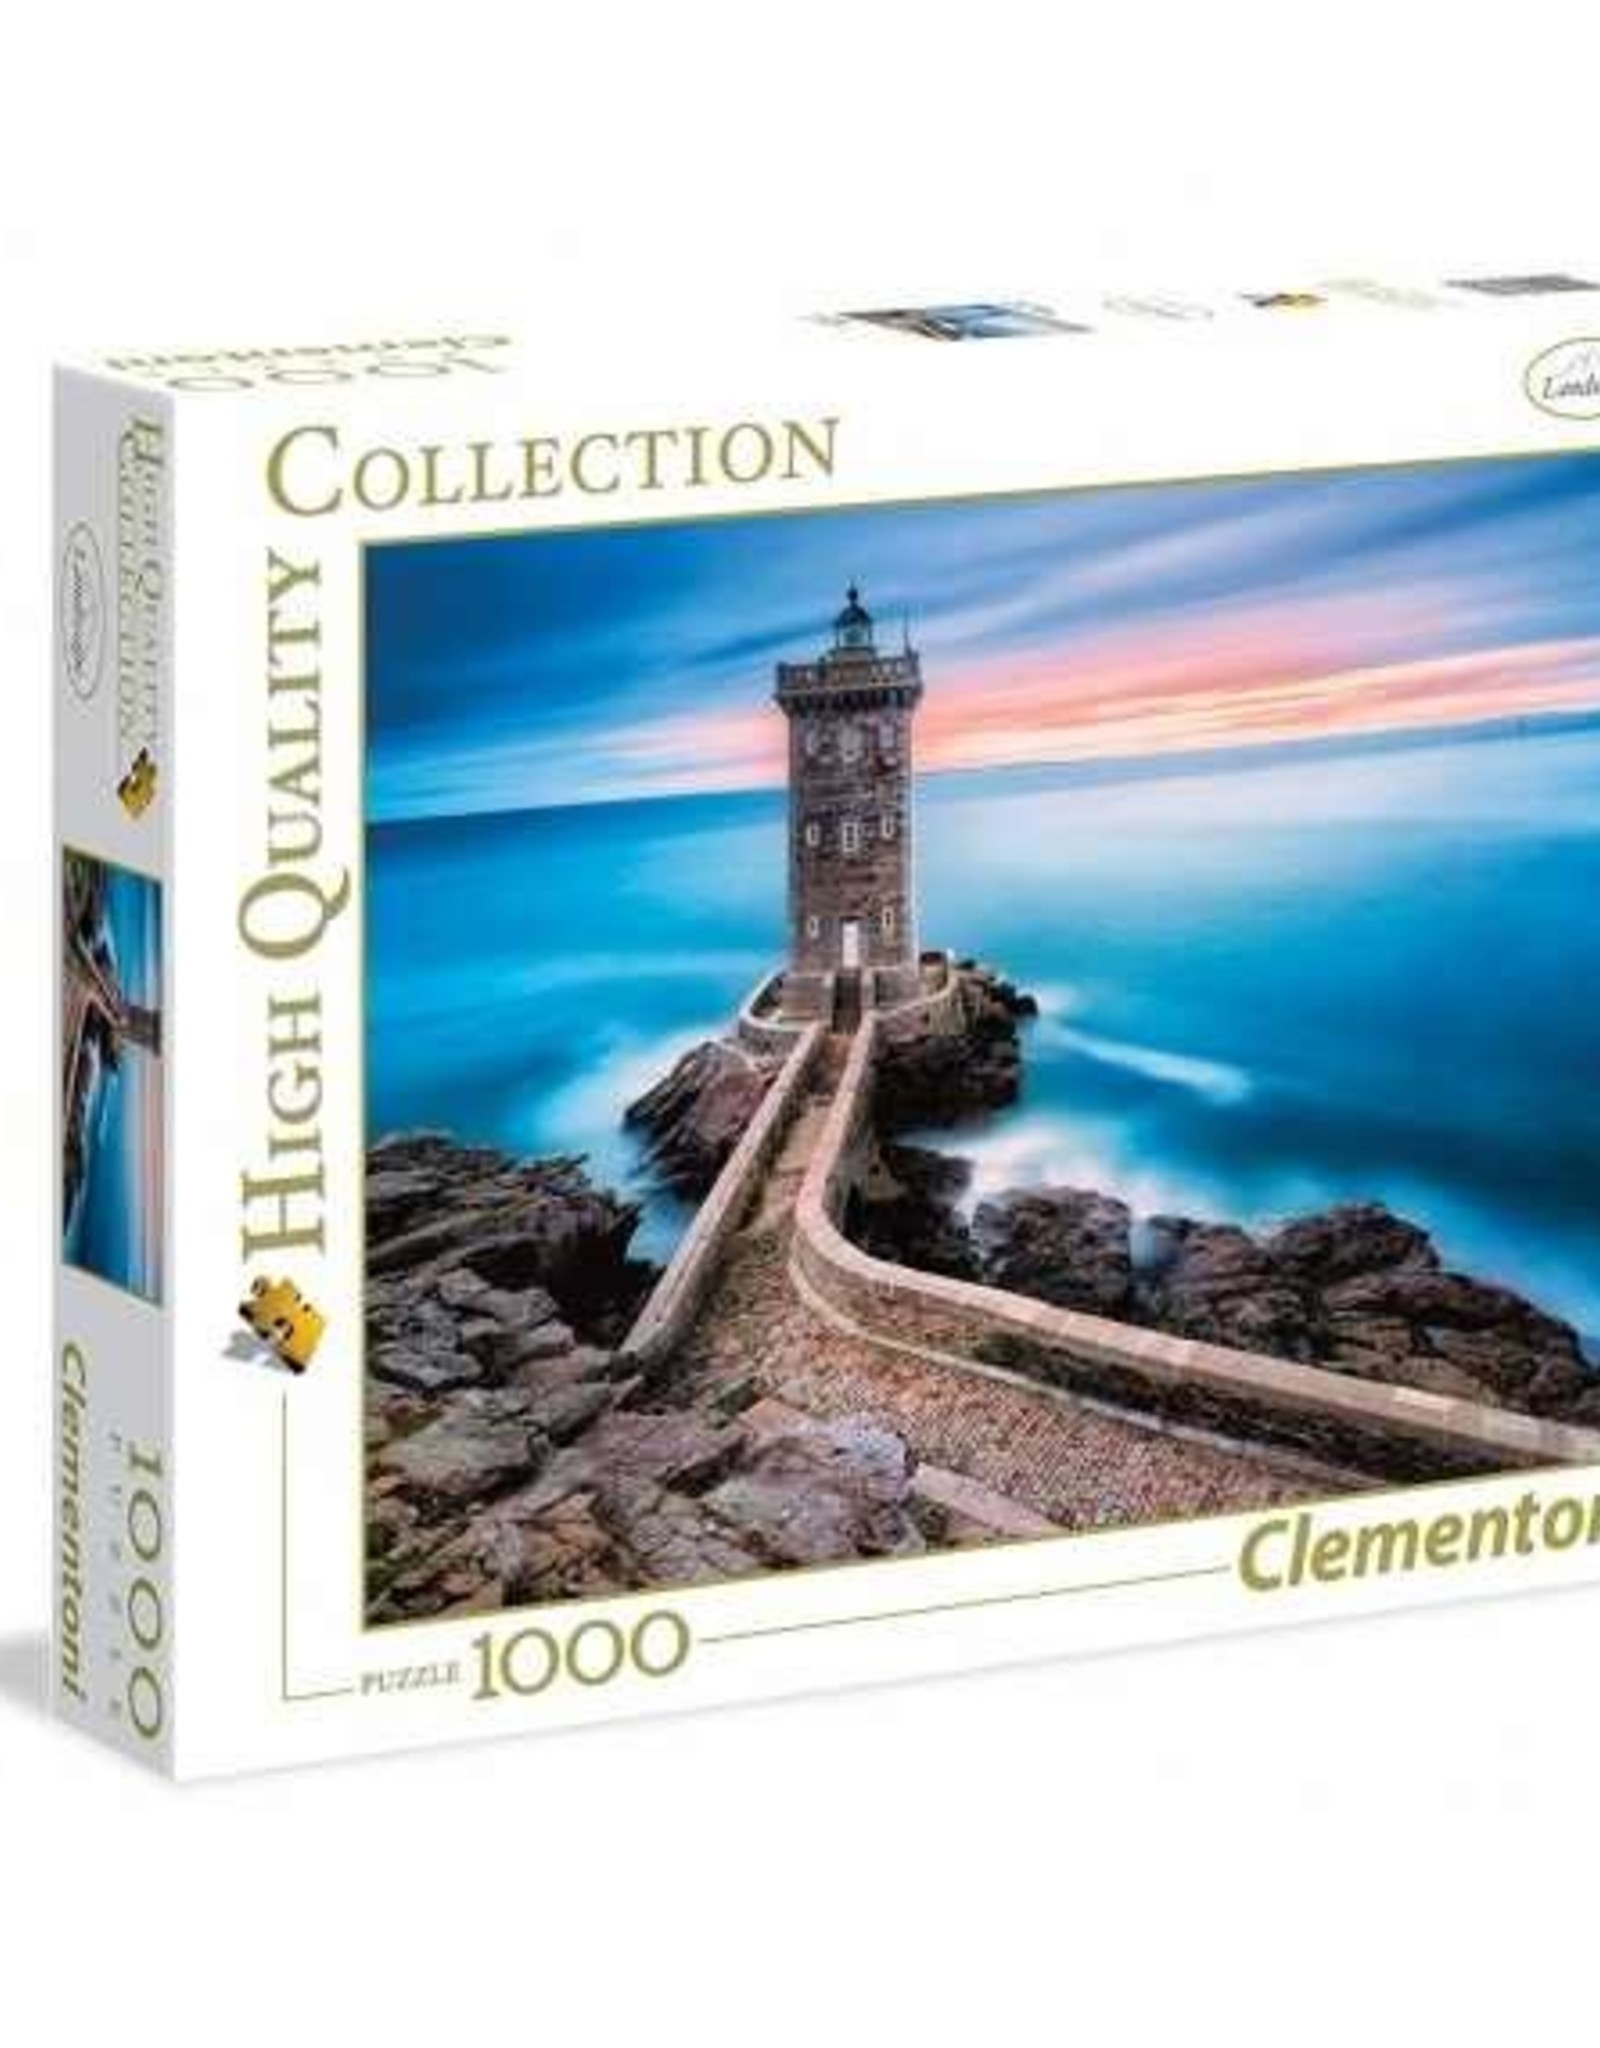 Clementoni 1000PC HQC - THE LIGHTHOUSE